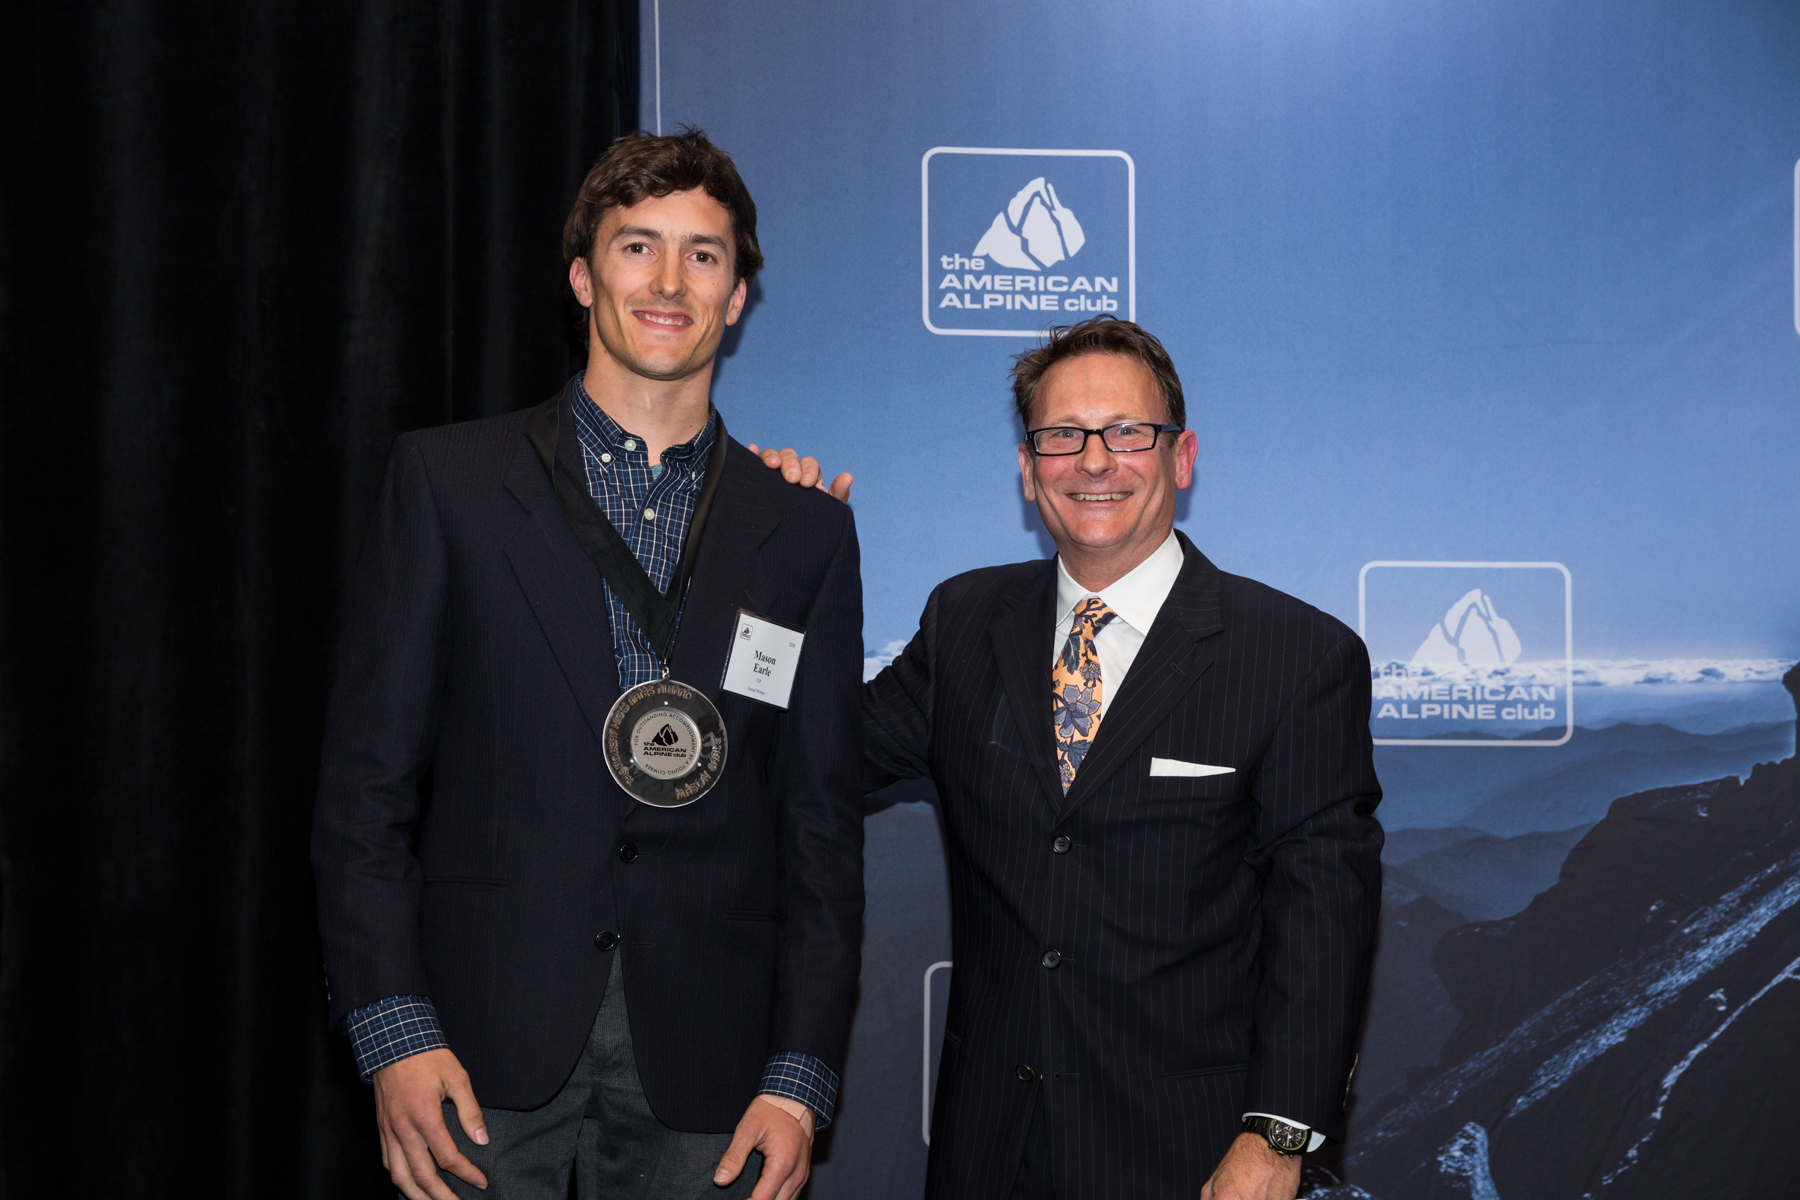 Phil Powers presenting the Bates Award to Mason Earle.  Photo: Tegra Nuess